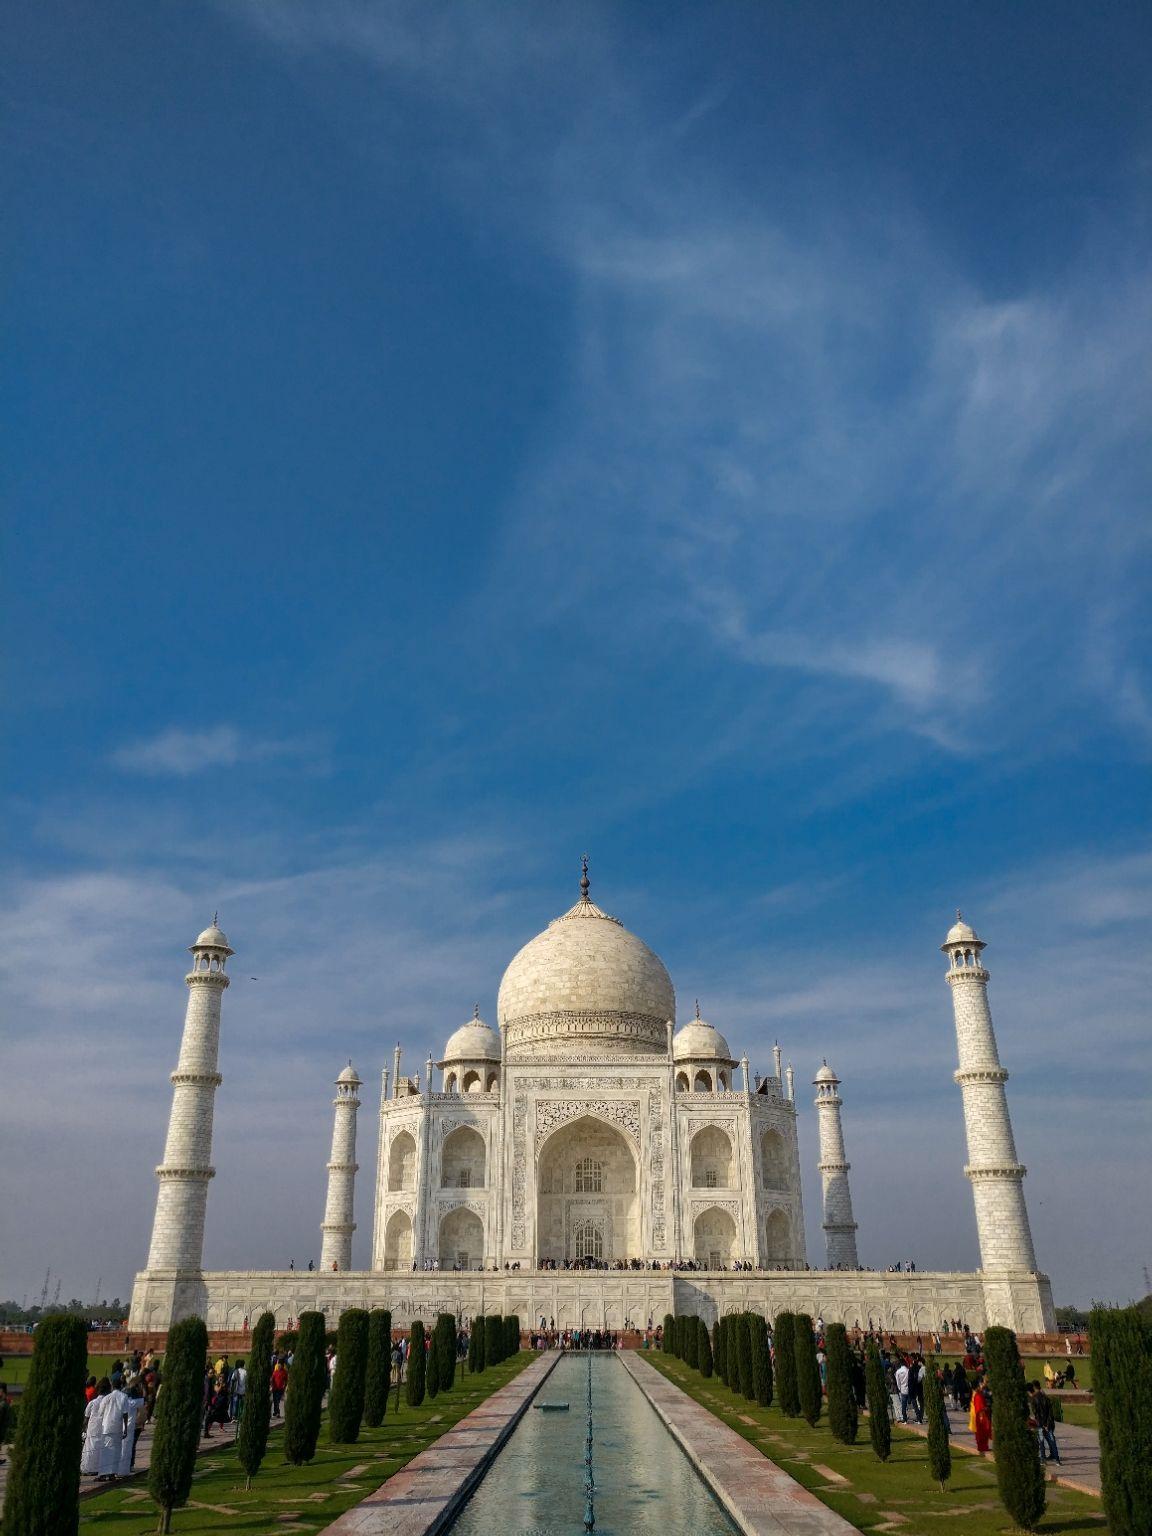 Photo of Taj Mahal By Sabeel Dhar